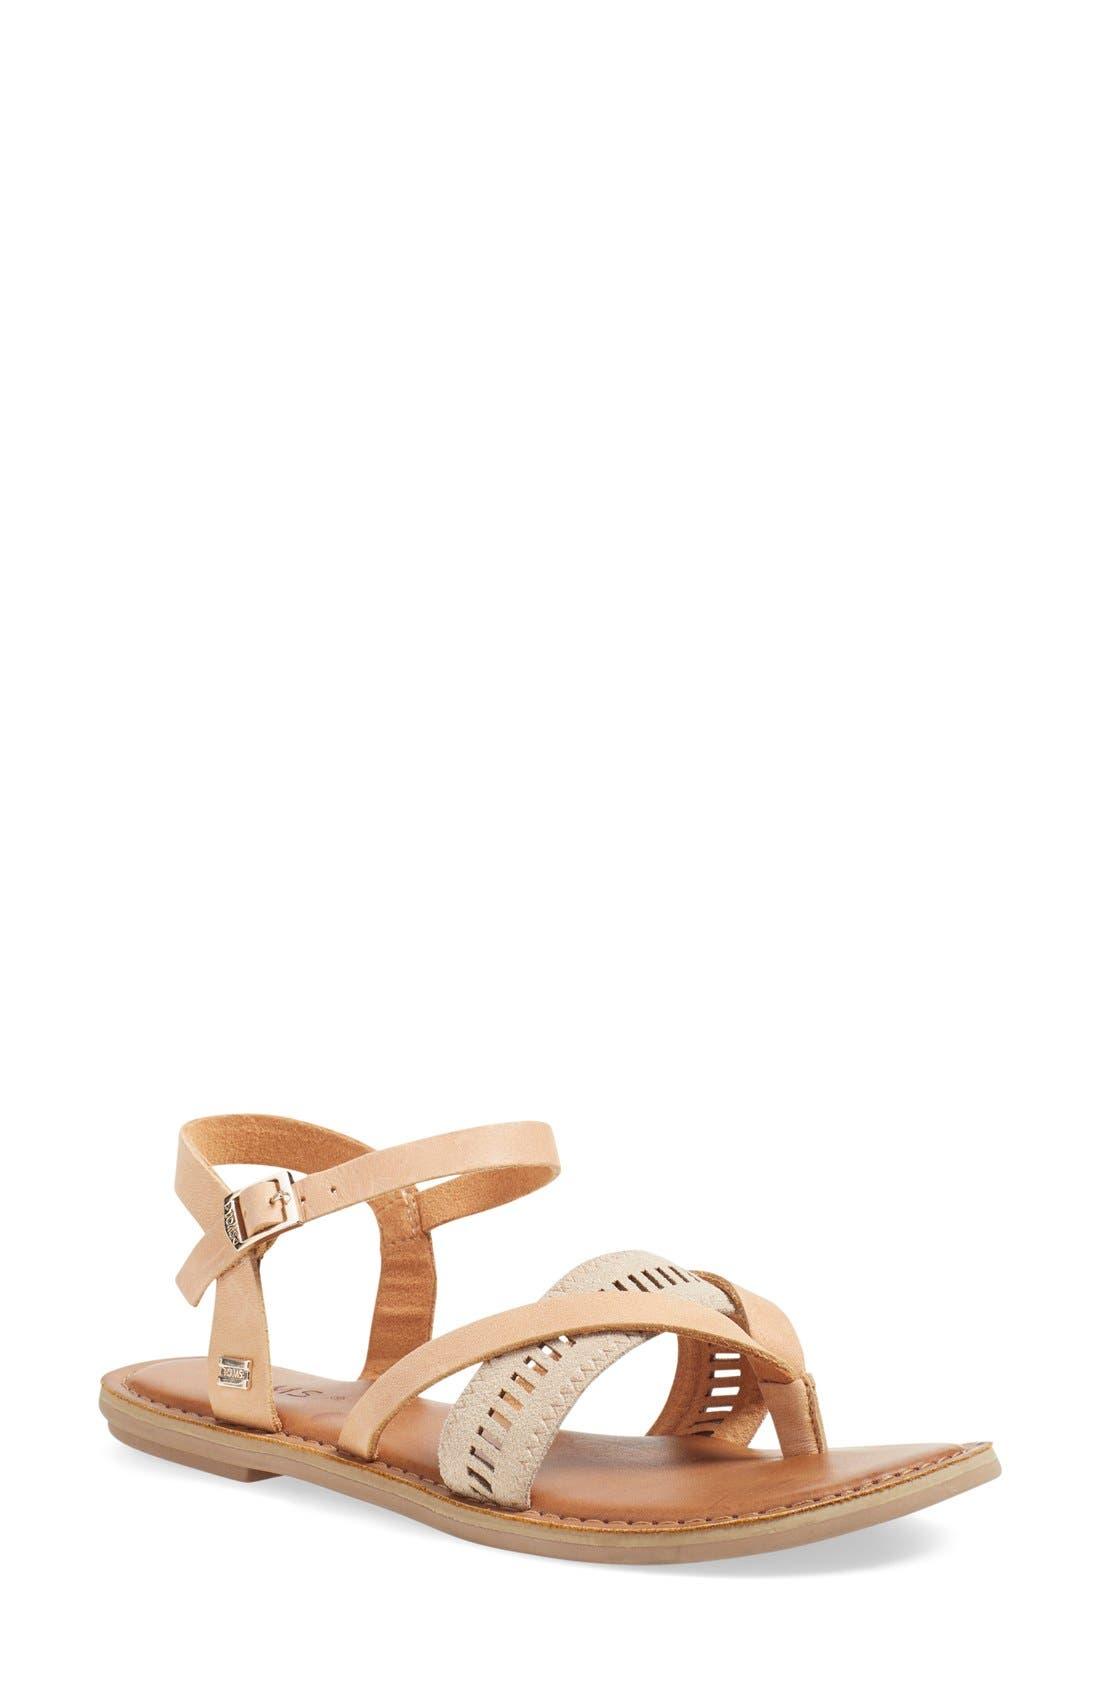 Main Image - TOMS 'Lexie' Sandal (Women)